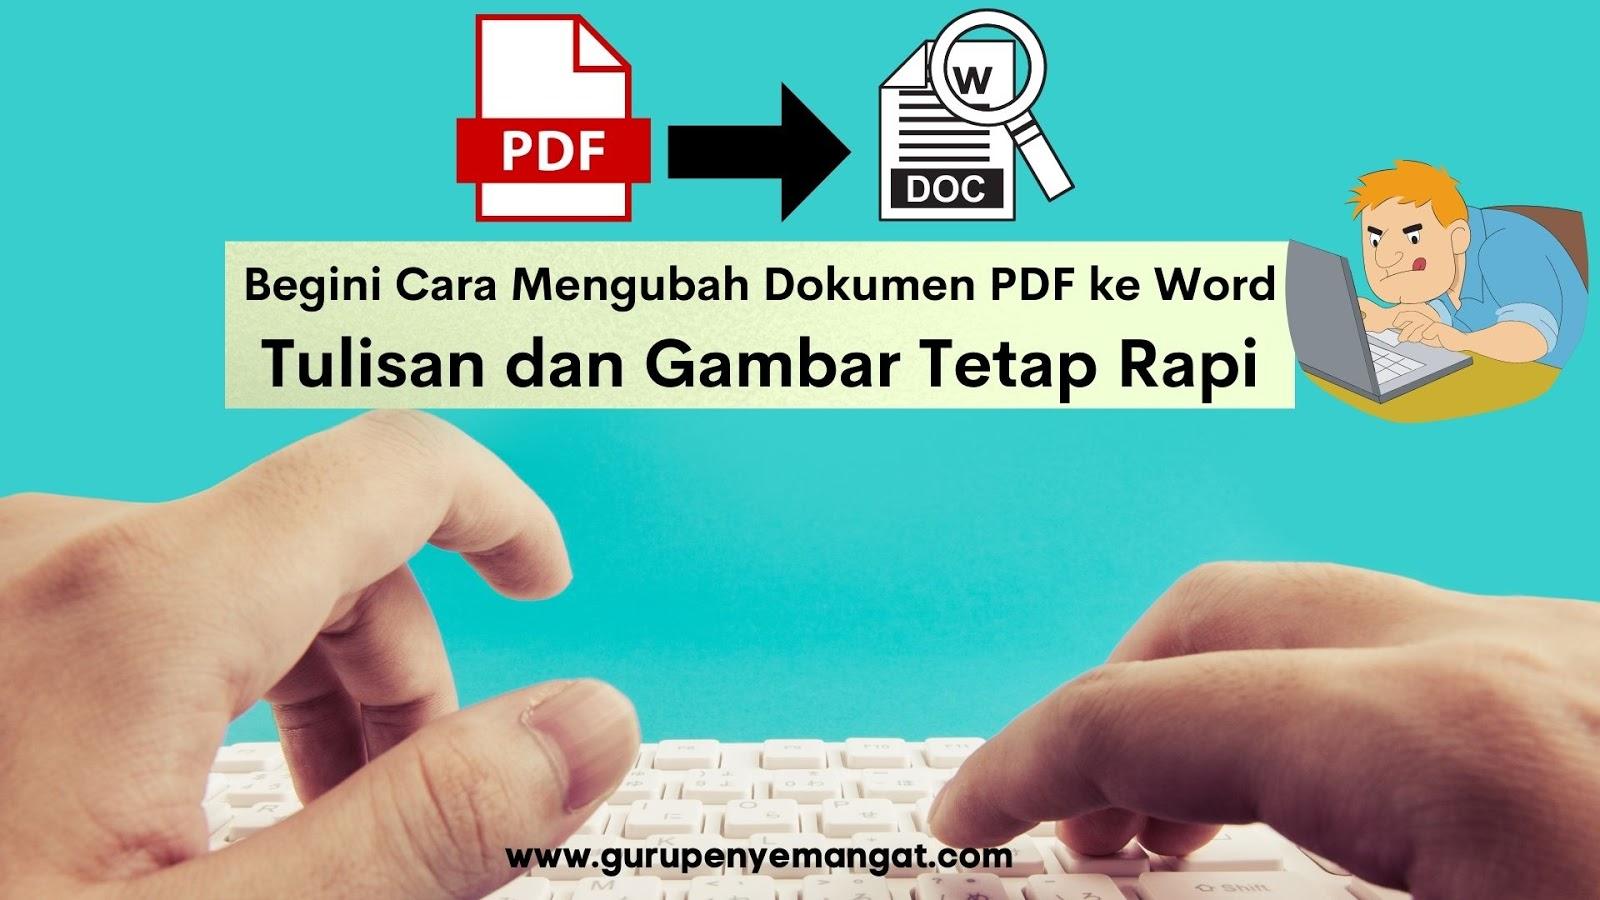 Begini Cara Mengubah Dokumen PDF ke Word, Tulisan dan Gambar Tetap Rapi